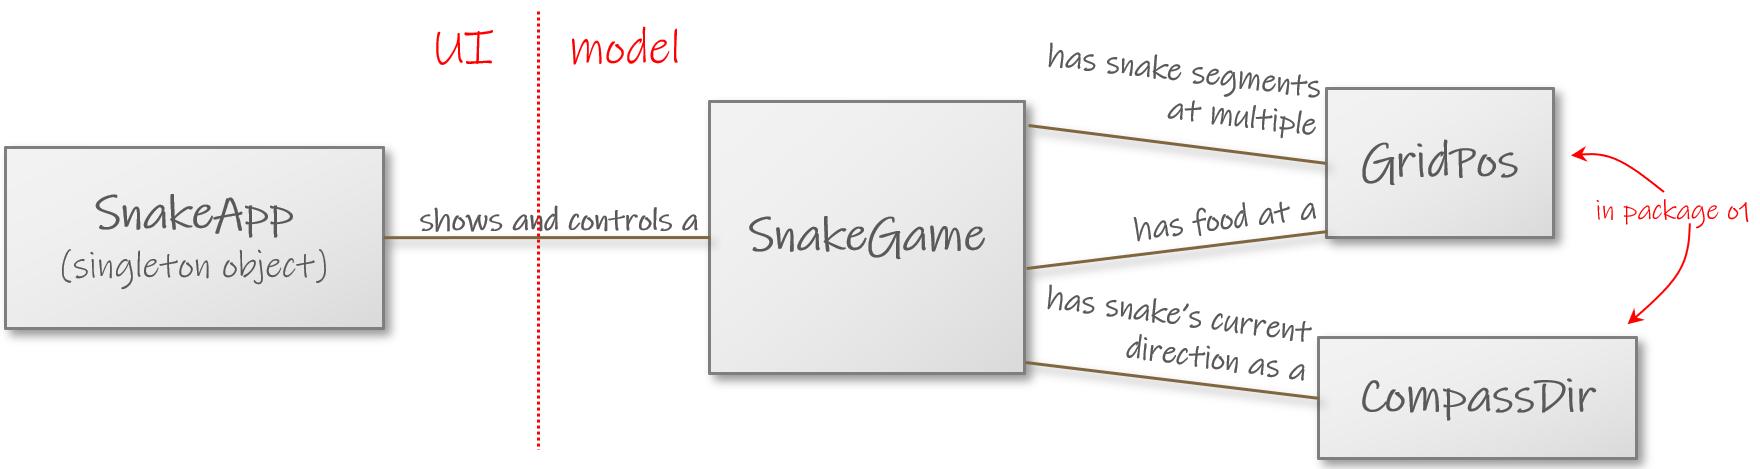 ../_images/module_snake.png